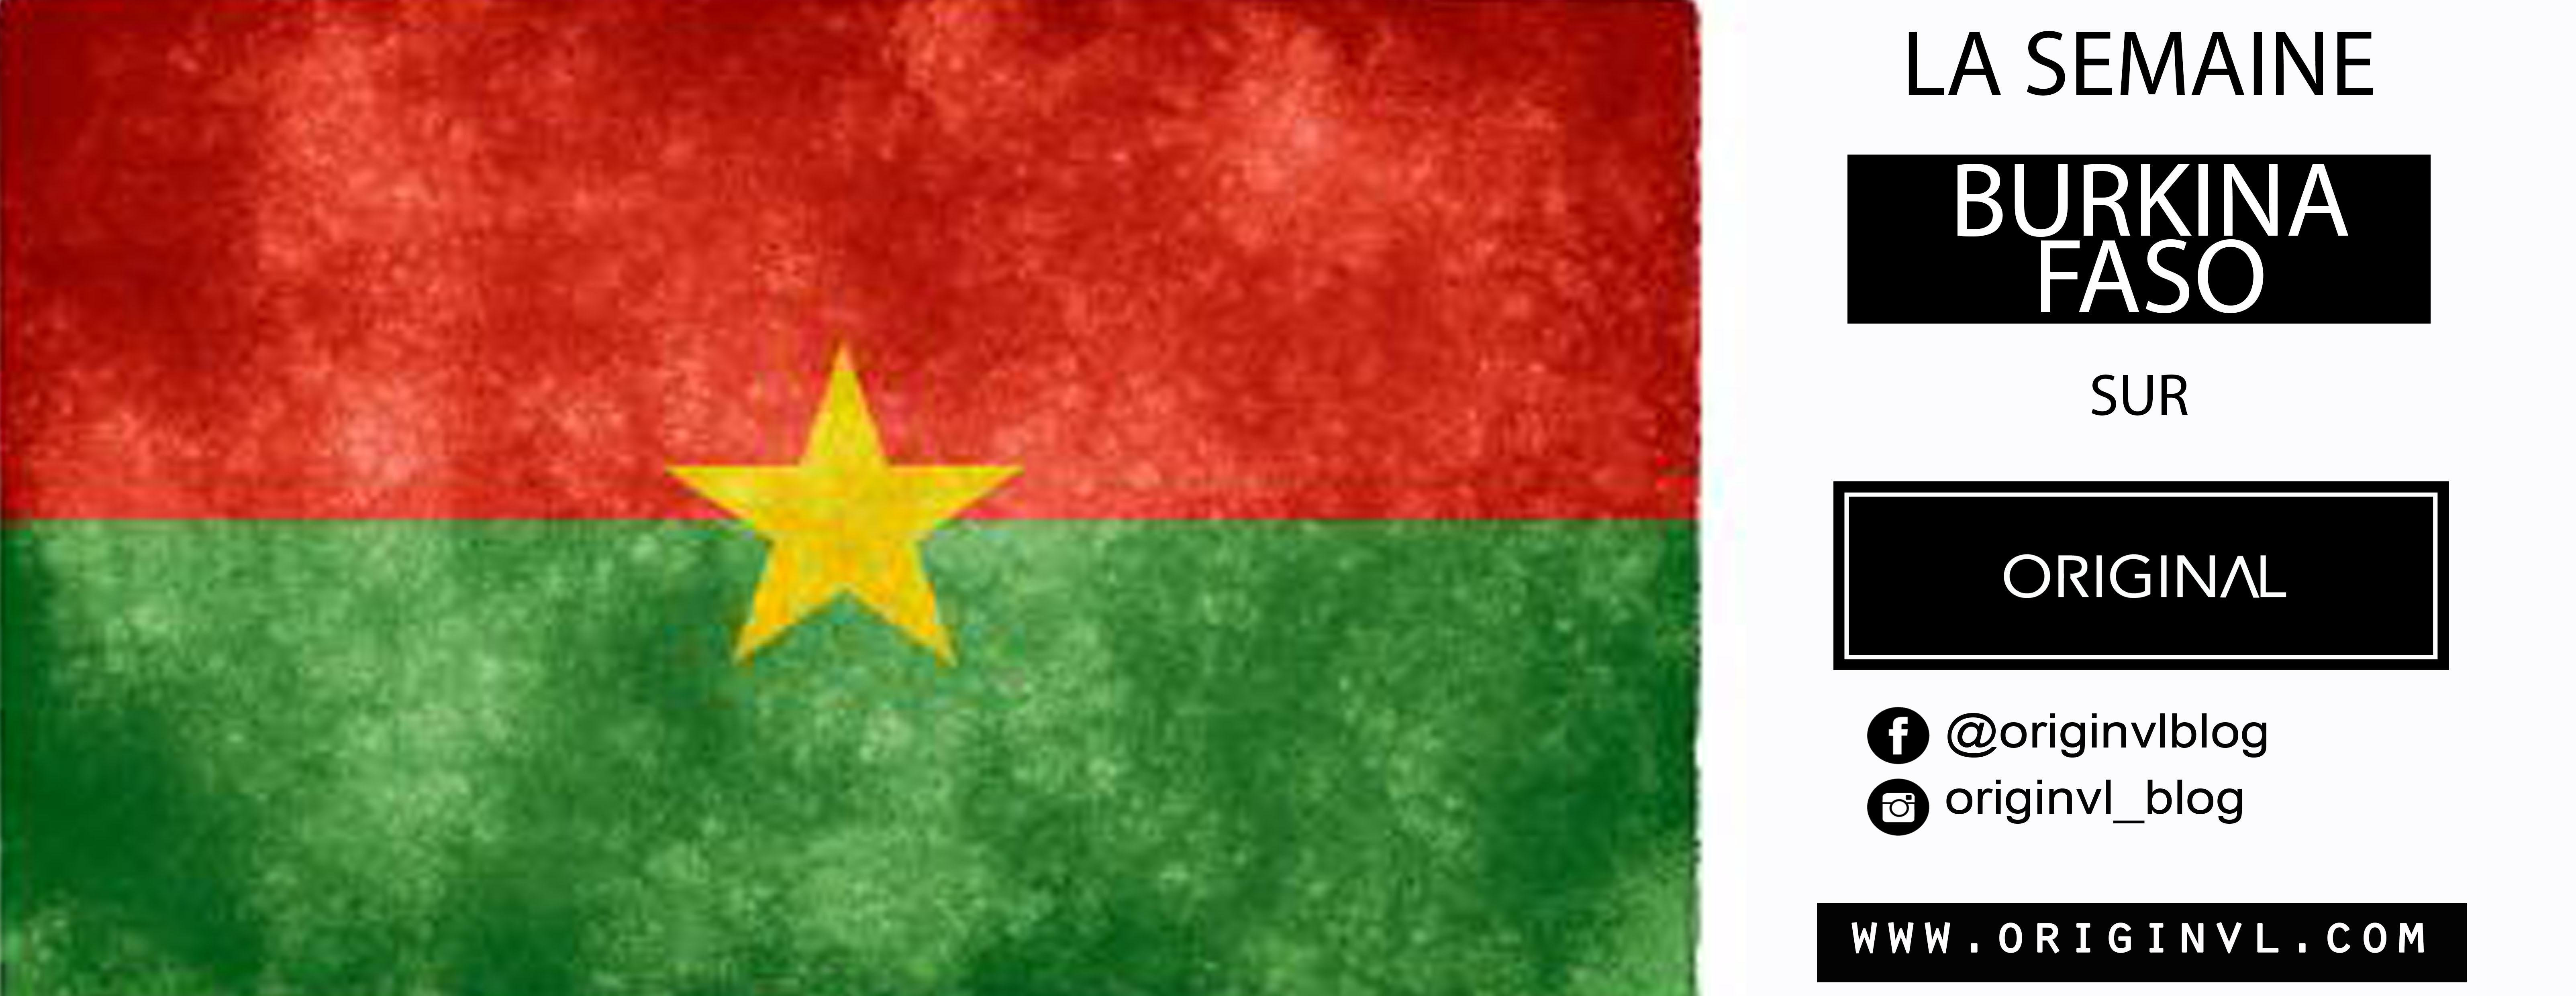 Top 10 des choses à faire à Ouagadougou (Burkina Faso)